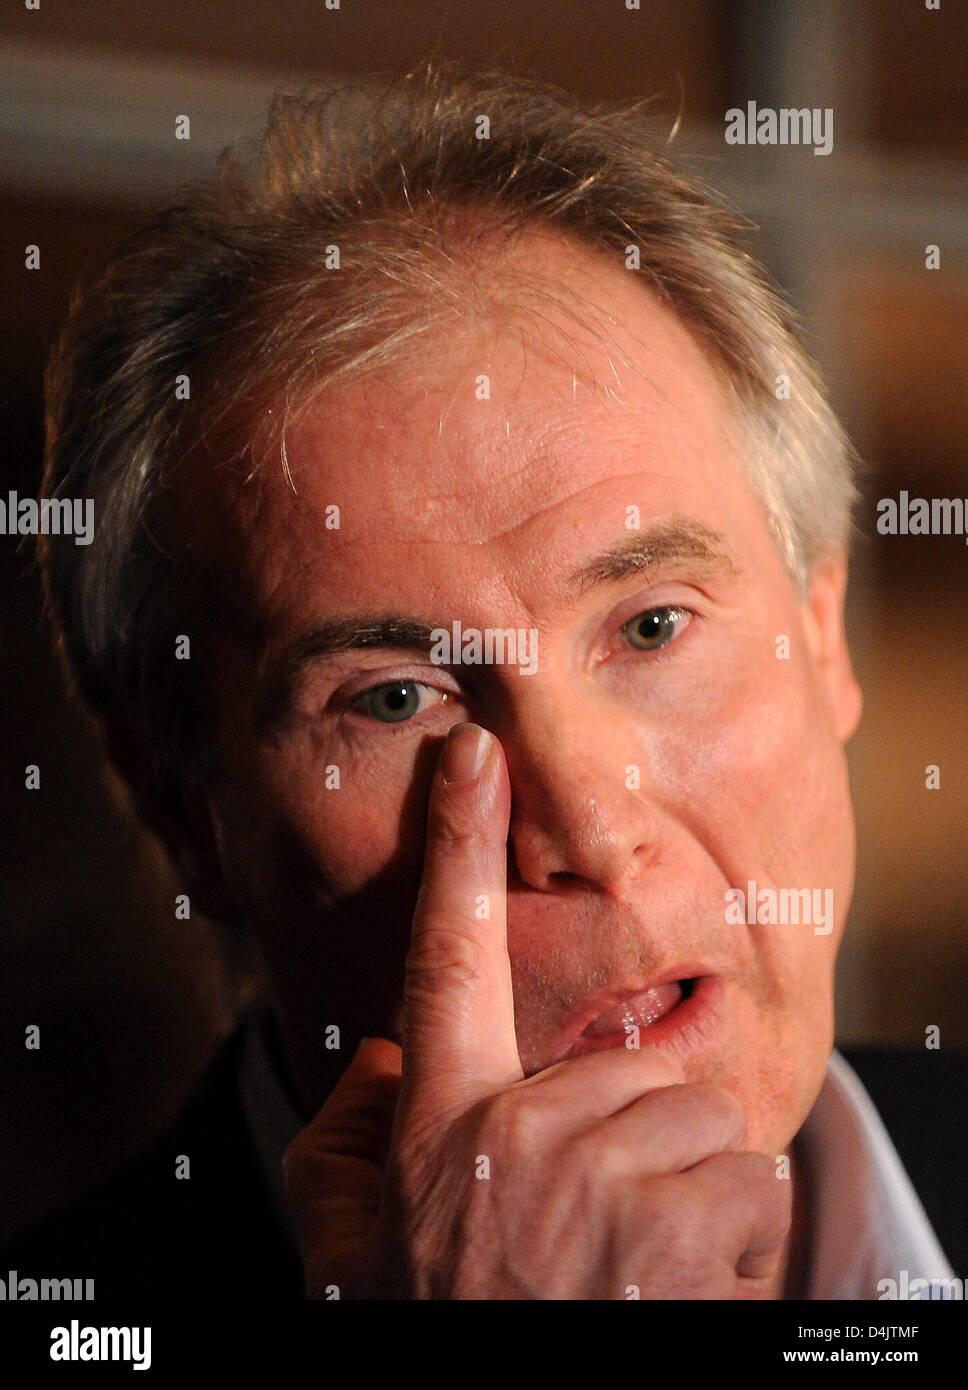 Uwe Schenker, managing director of German handball club THW Kiel, gestures during a crisis meeting of Handball league - Stock Image